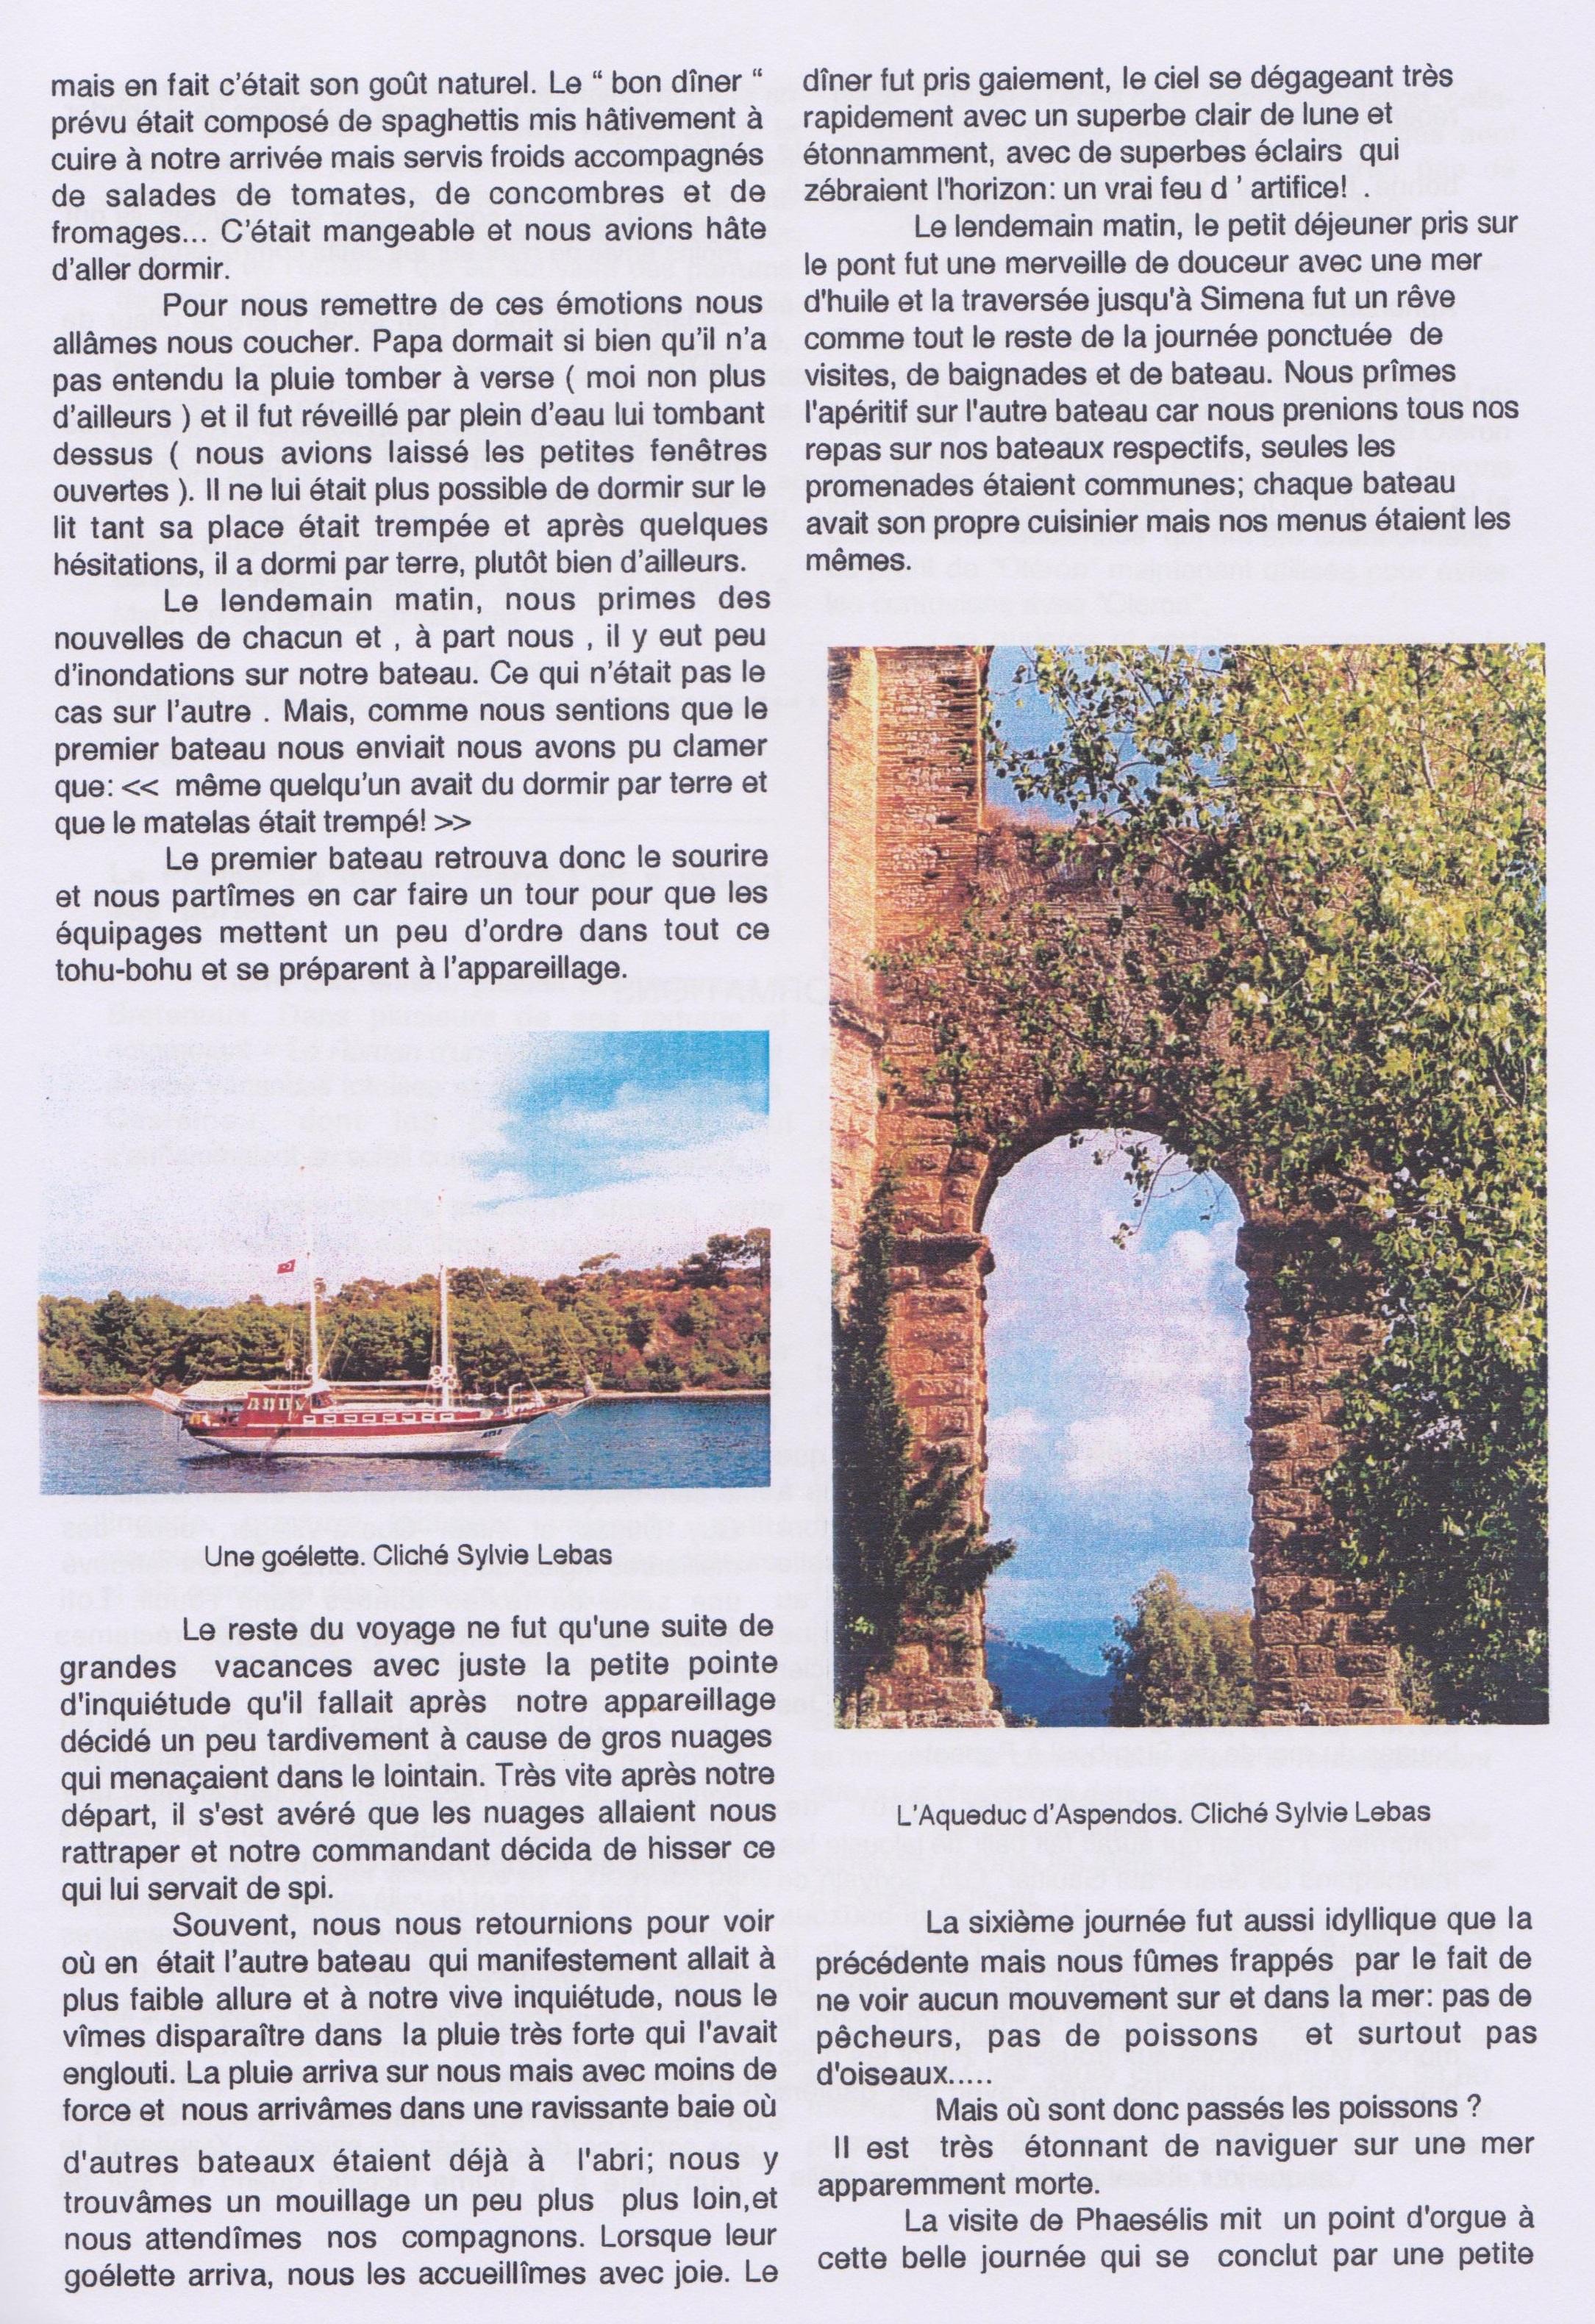 Voyage en Turquie-du 6 au 13 octobre 2000-page4a